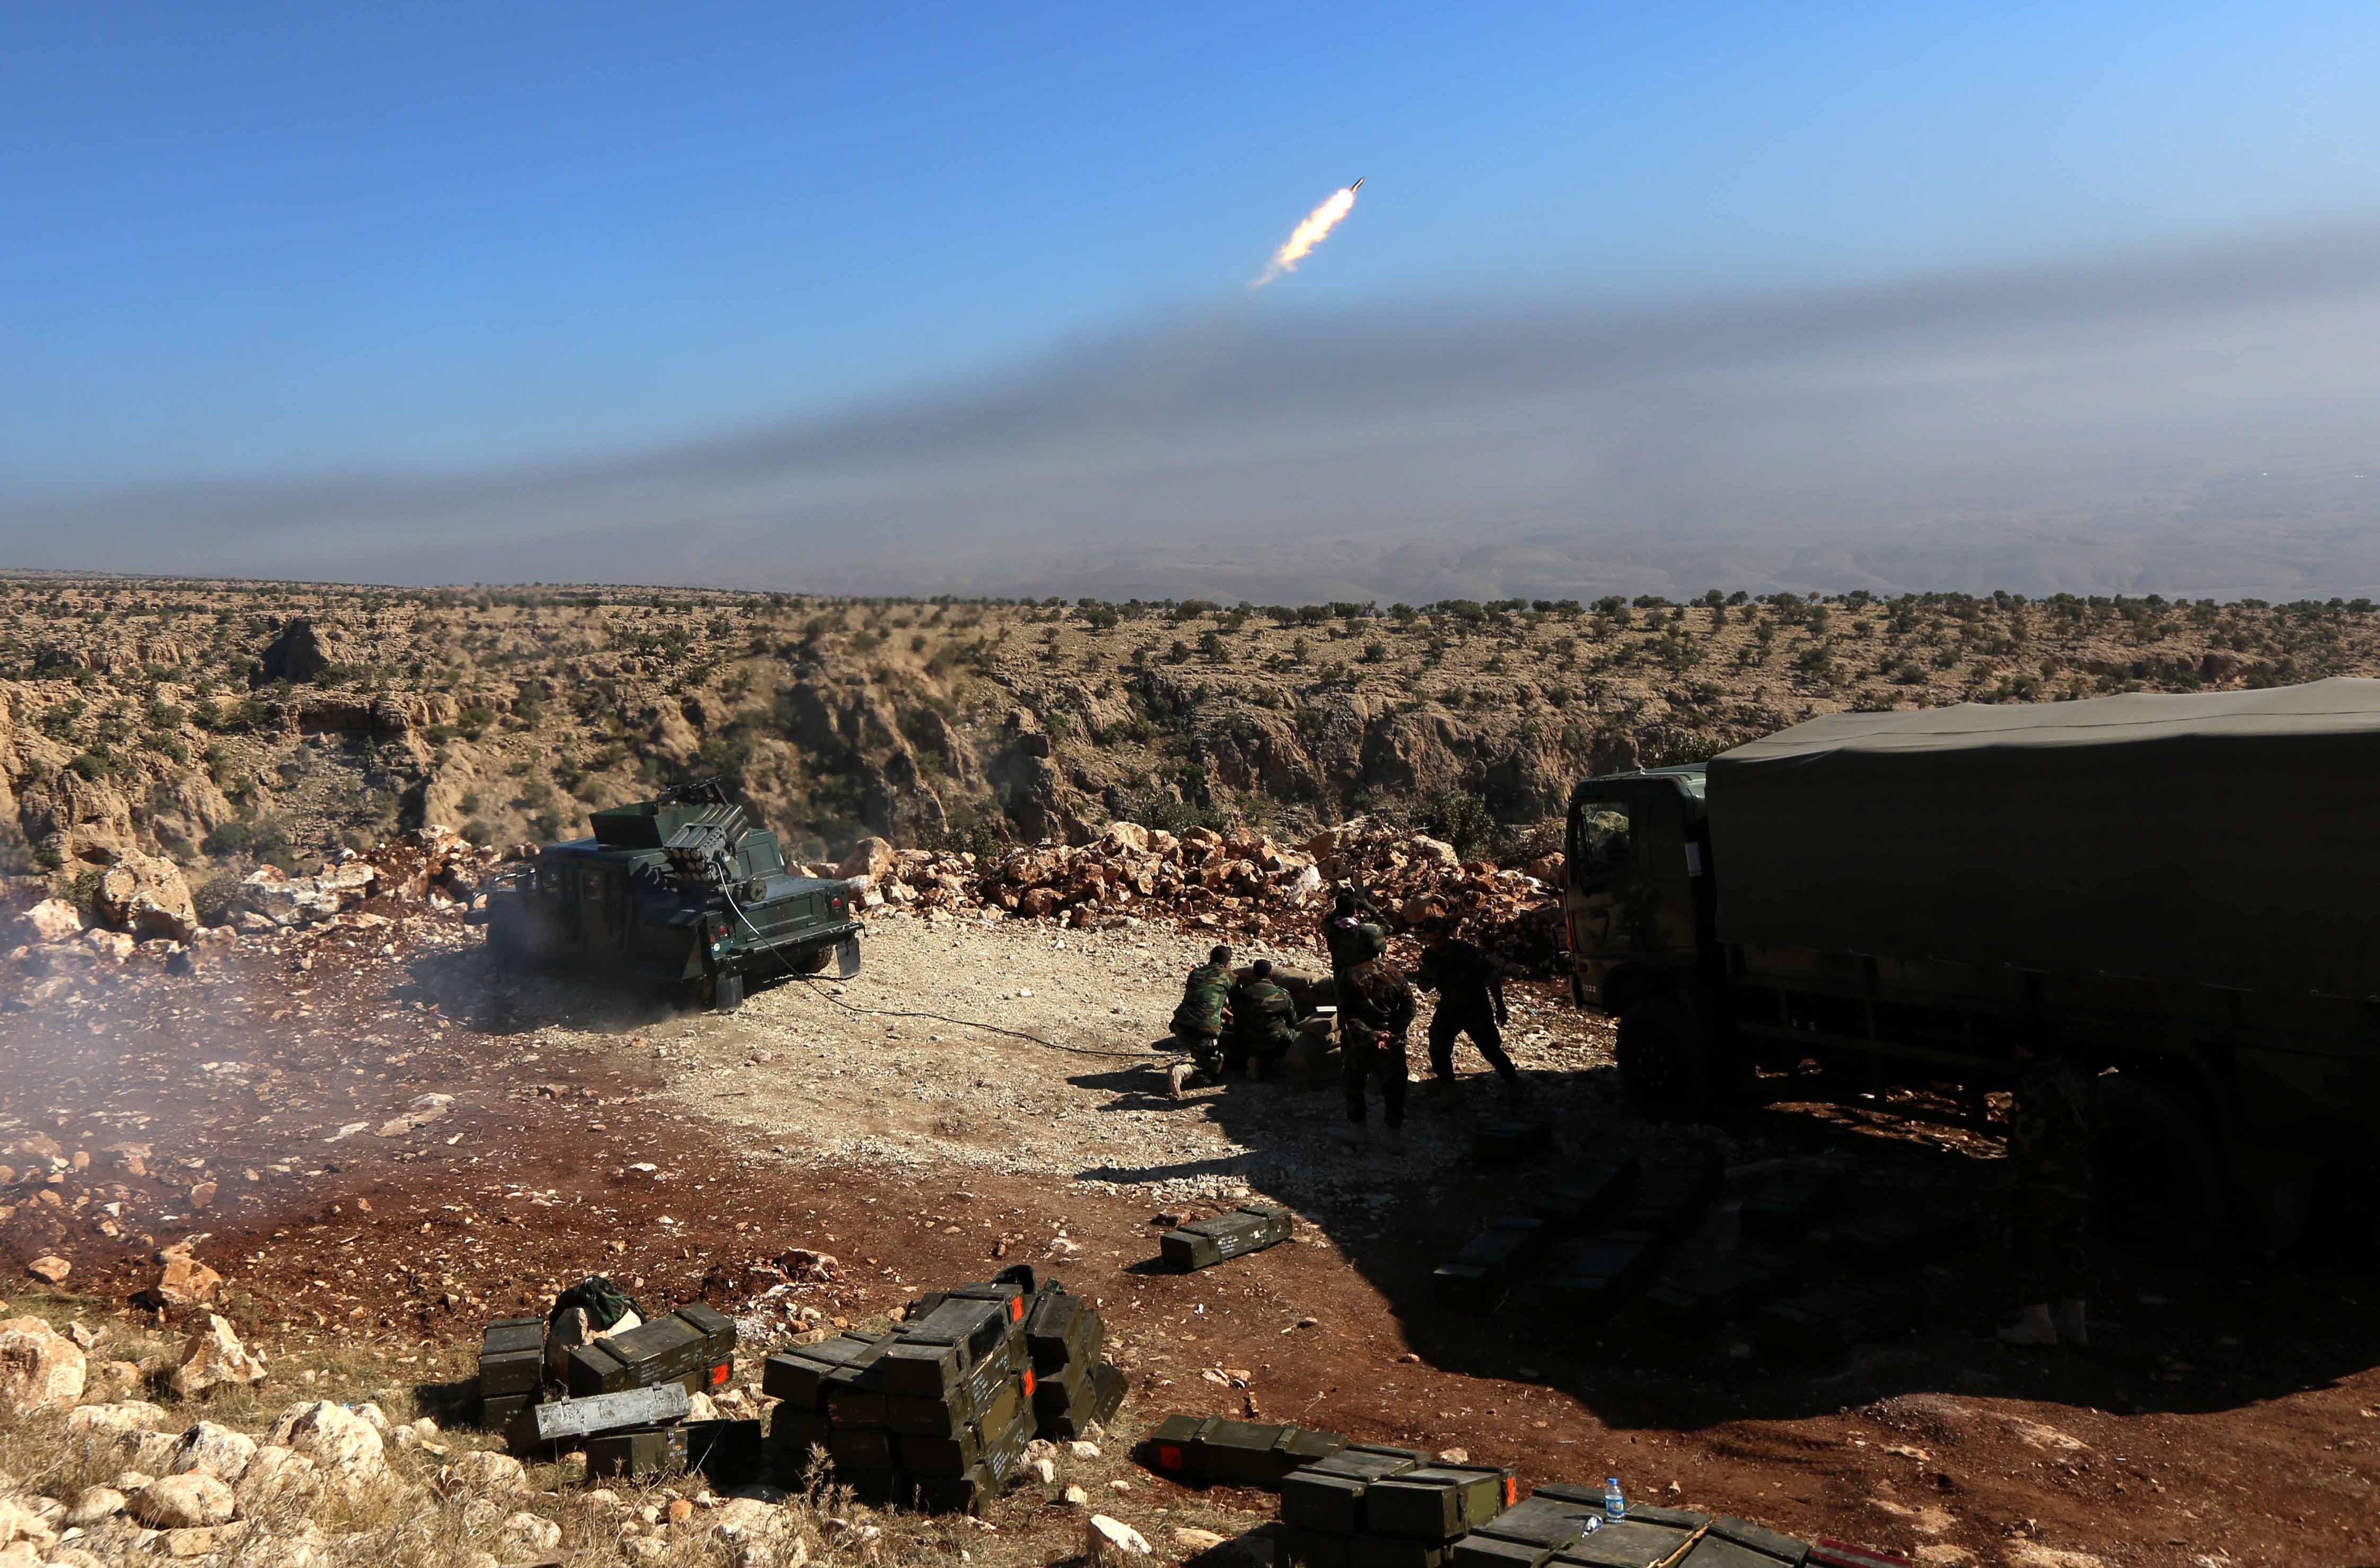 Iraqi Kurdish forces take part in an operation backed by US-led strikes to retake Sinjar, on Nov. 12, 2015.